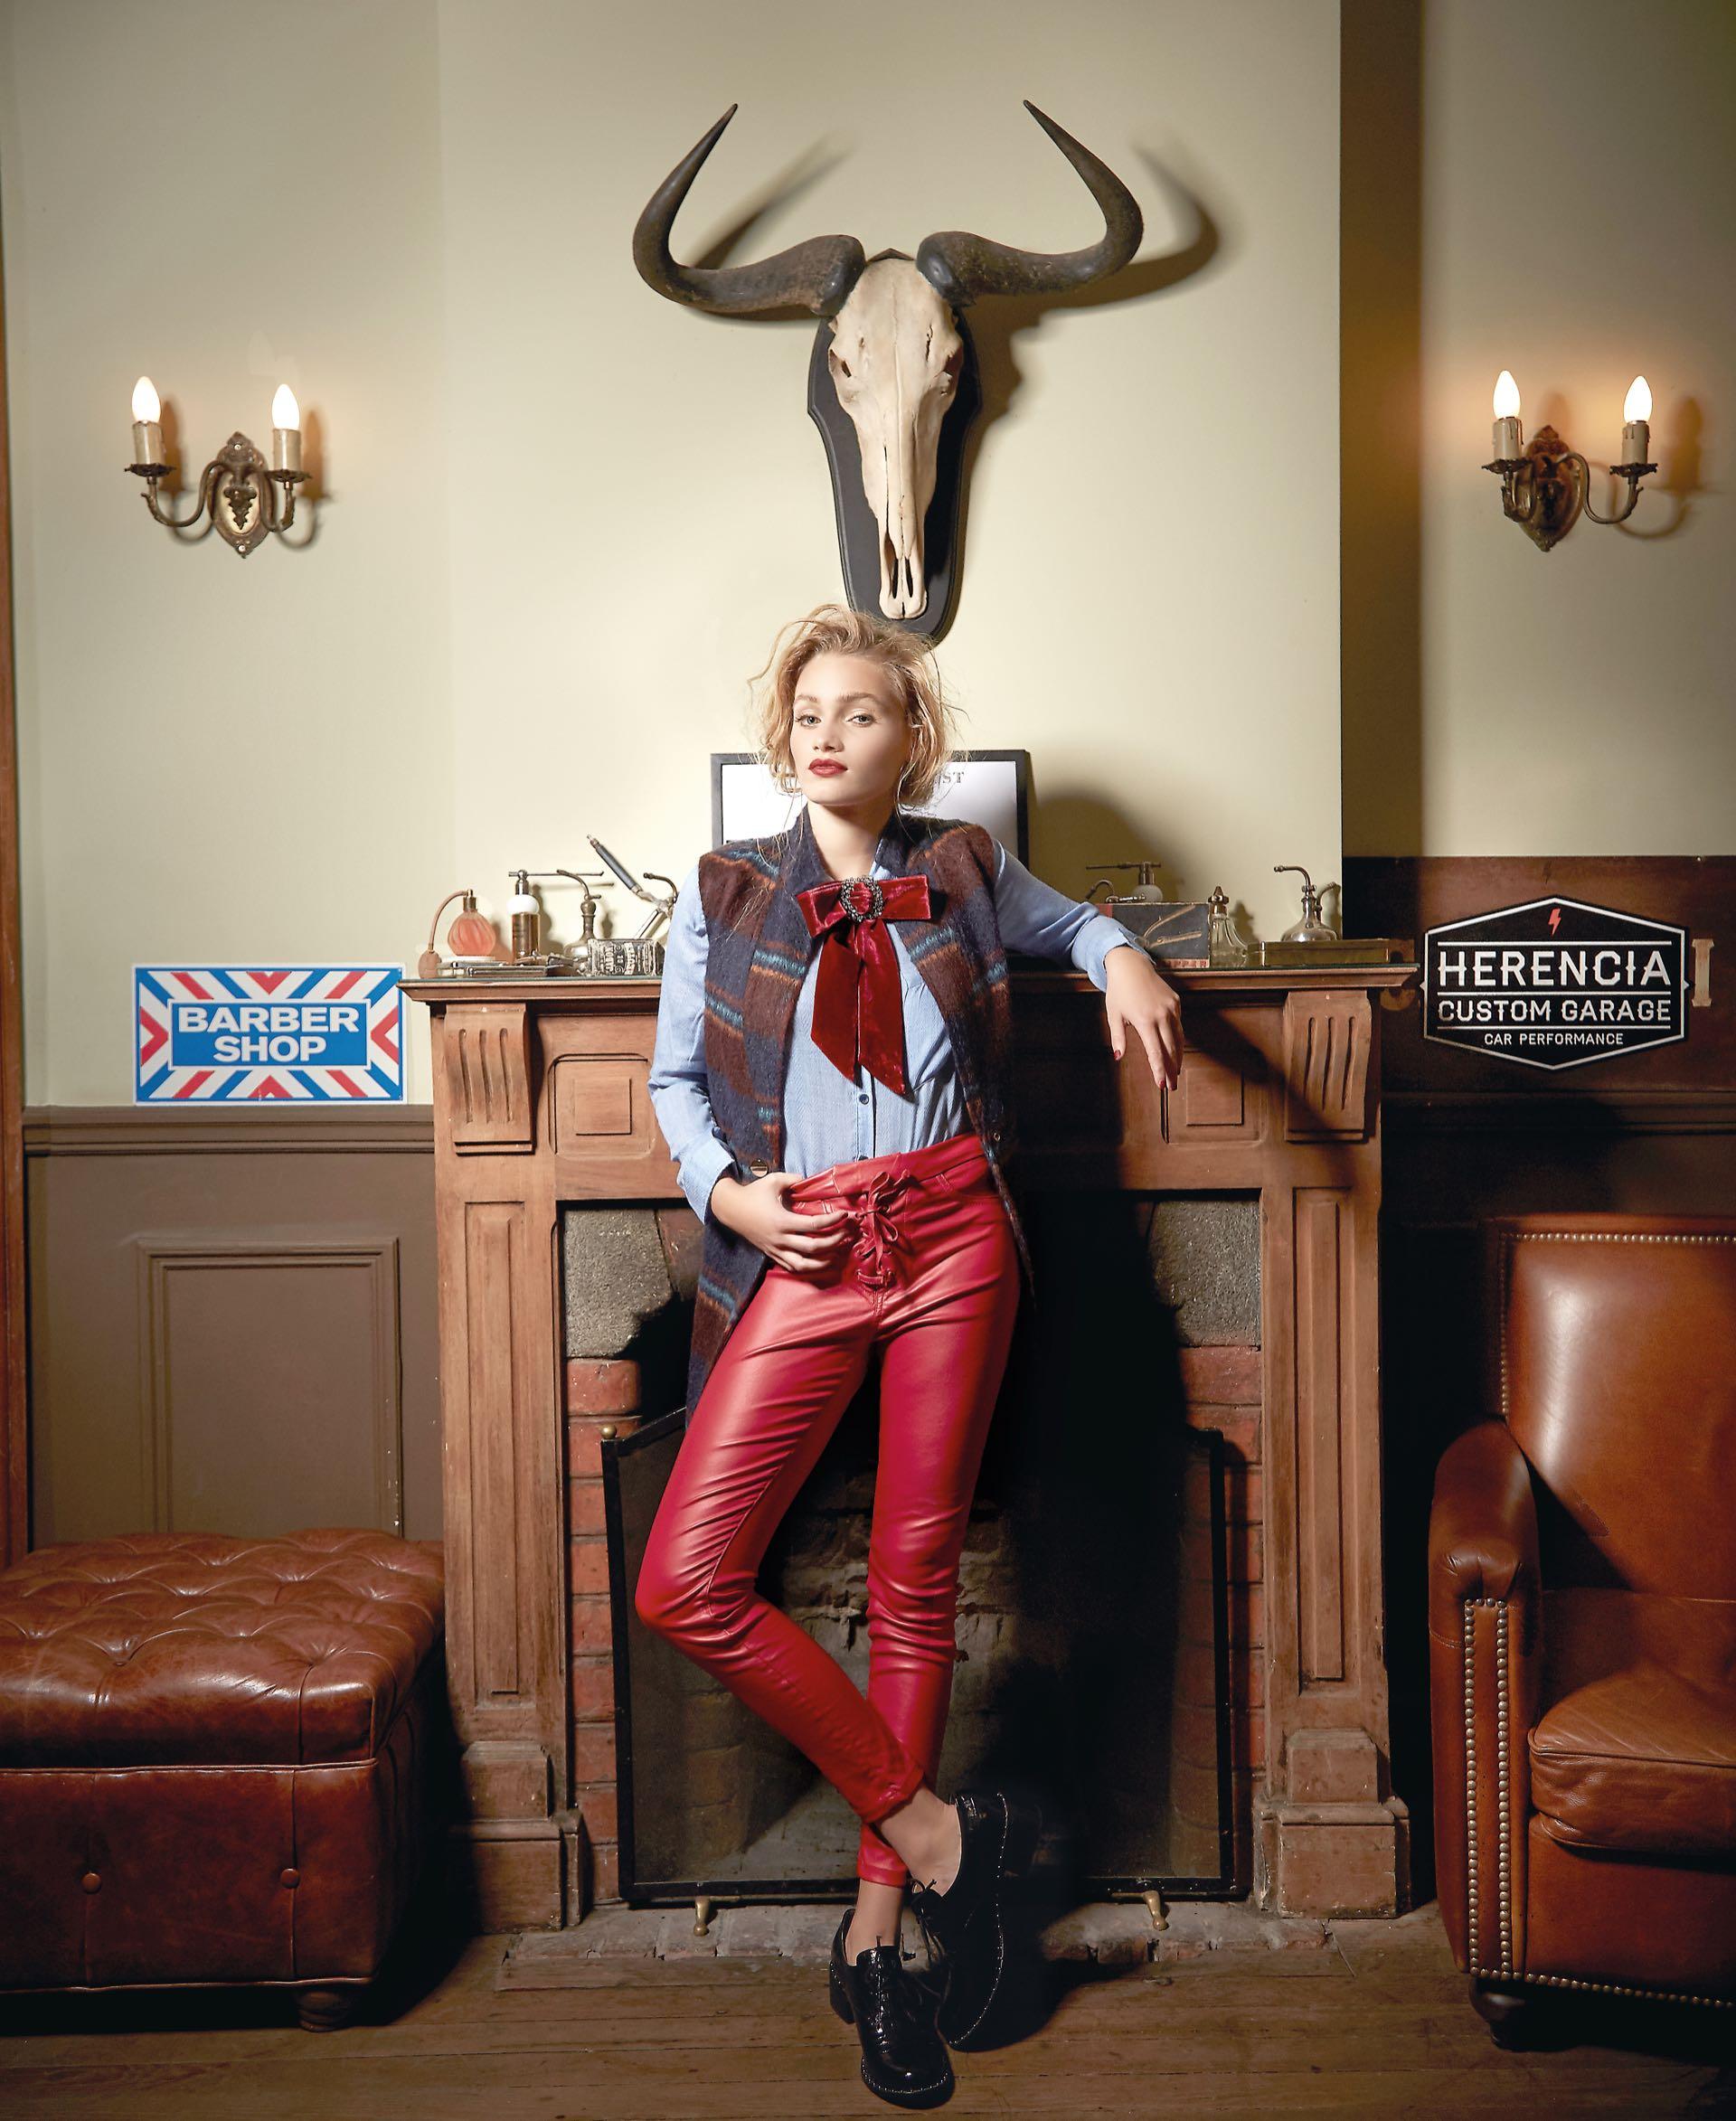 Chaleco escocés ($ 3.540, Carmela Achaval), camisa($ 2.890, Wanama), pantalón de cuero ecológico ($ 1.850, Kosiuko), moño de terciopelo ($ 980, Luna Garzón)y zapatos de croco redondos($ 5.700, Uma).